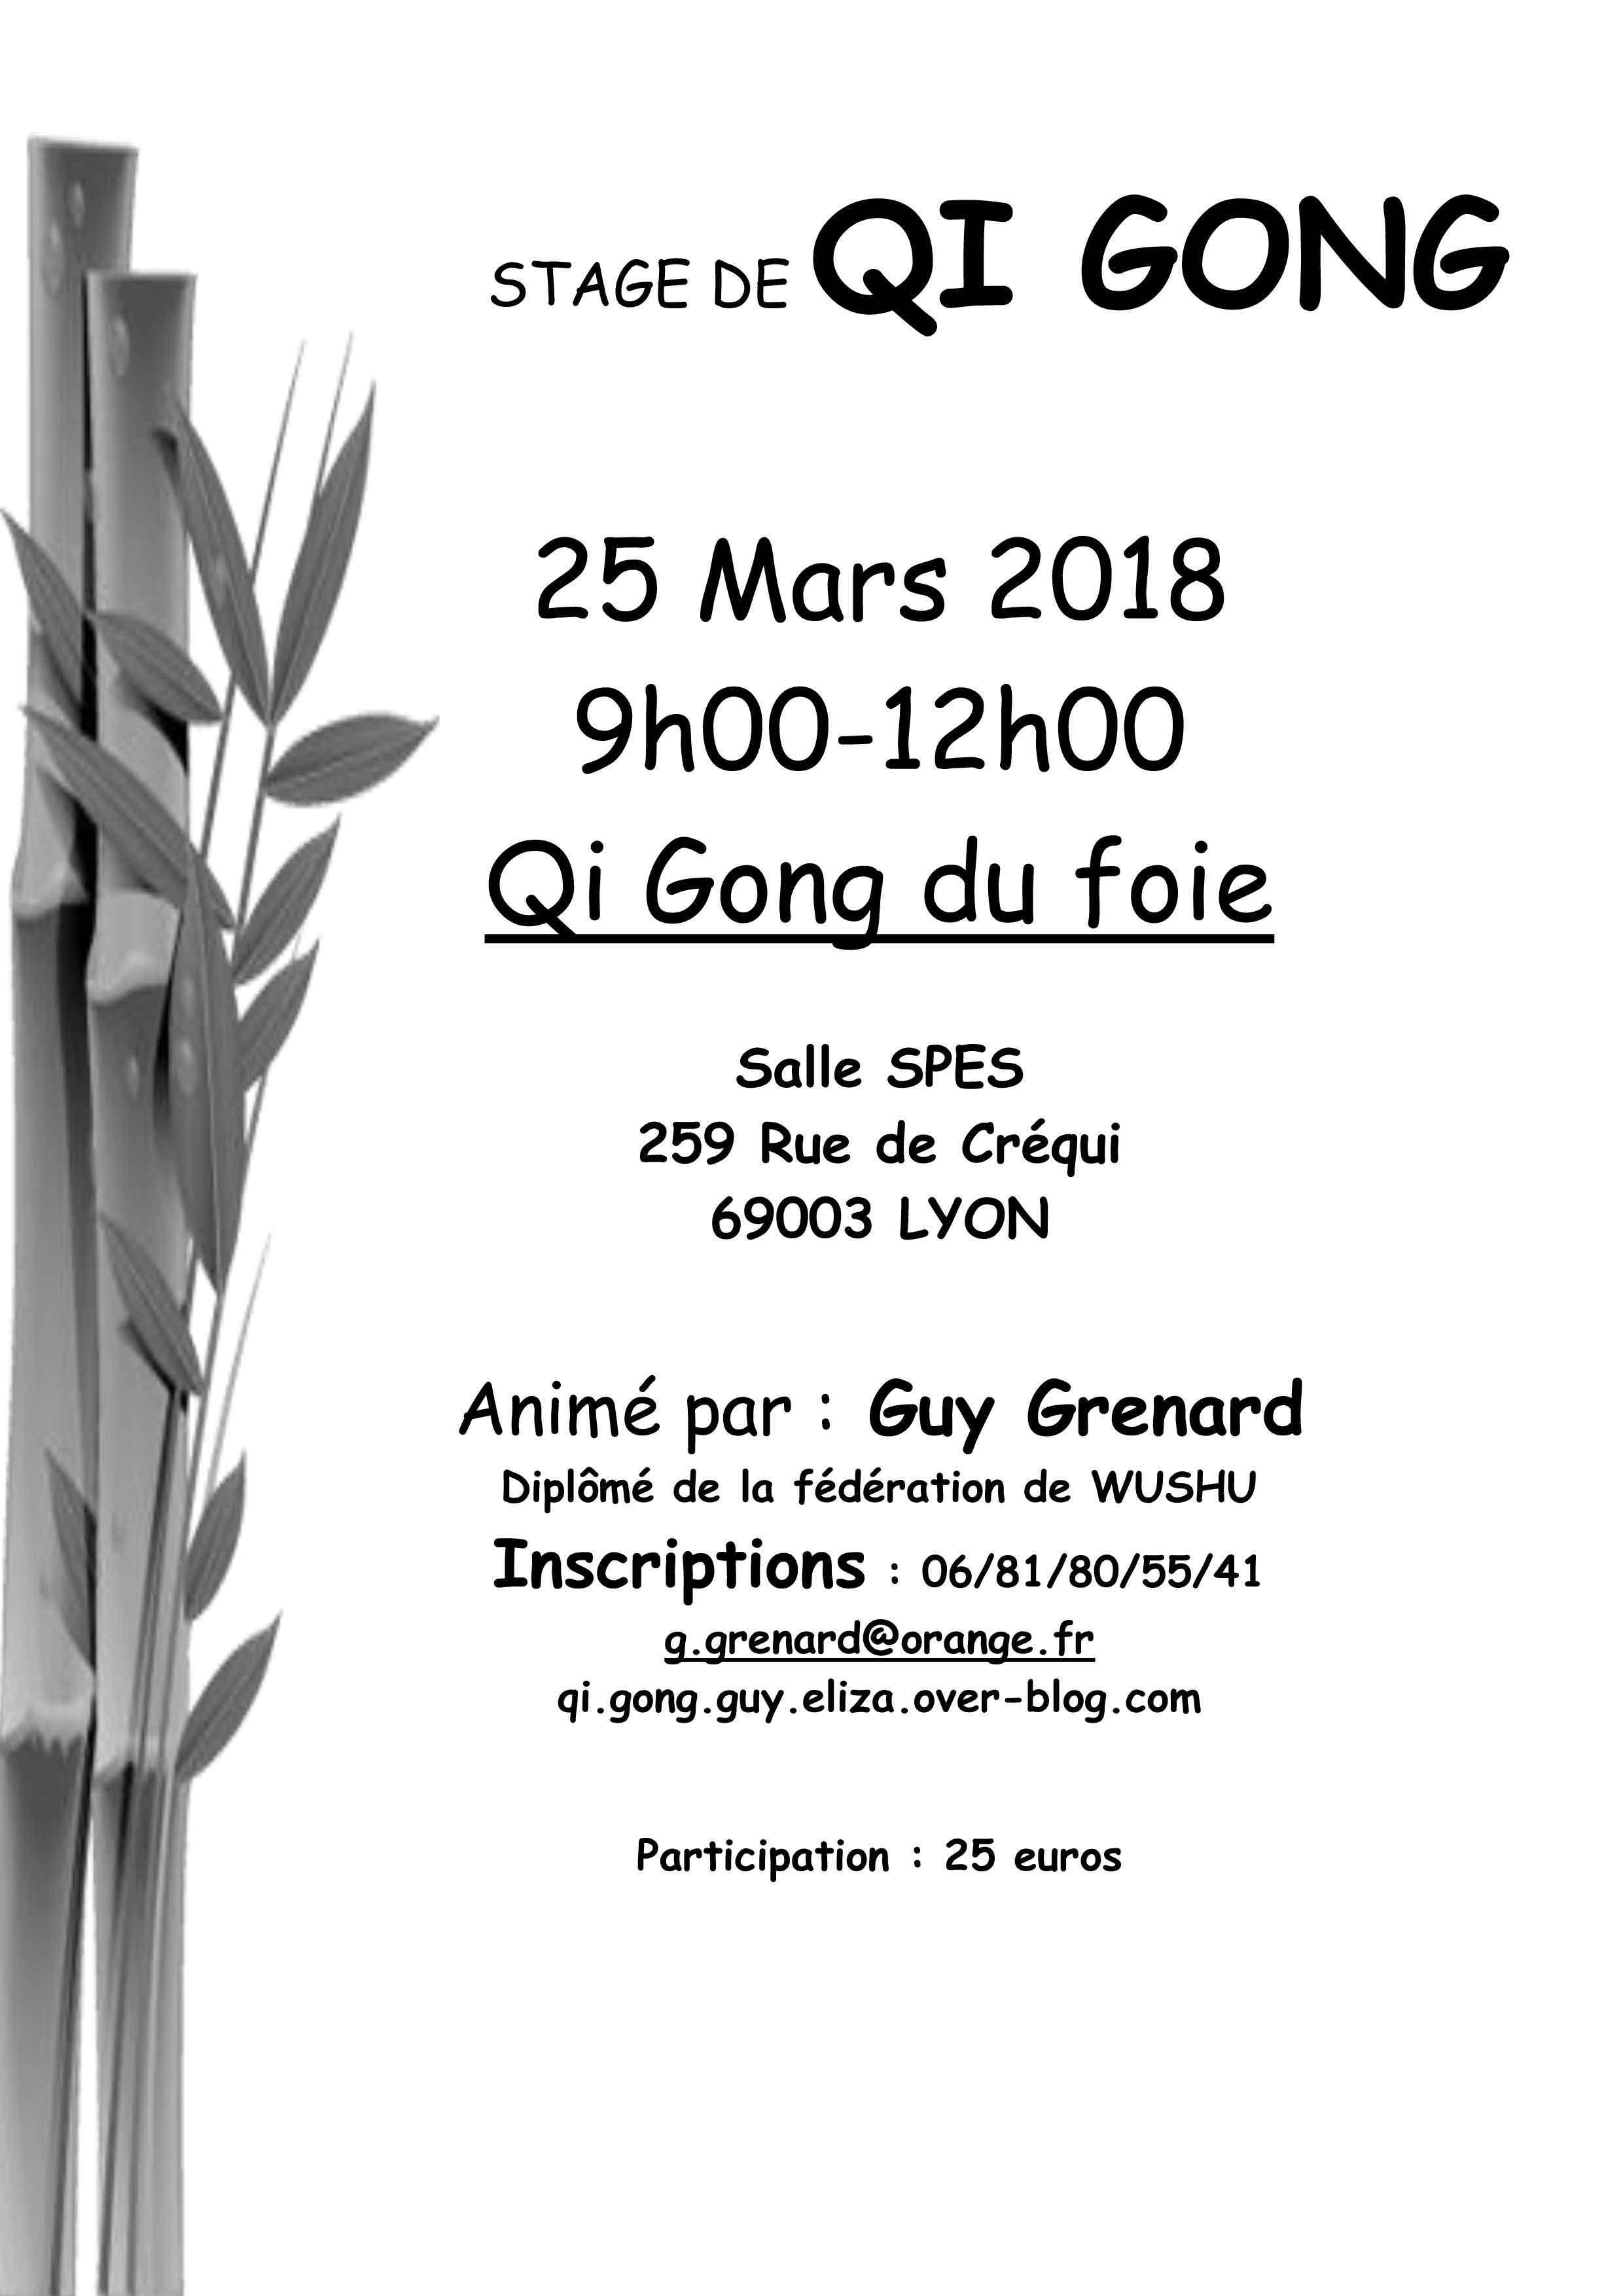 qi-gong-du-foie2018-1